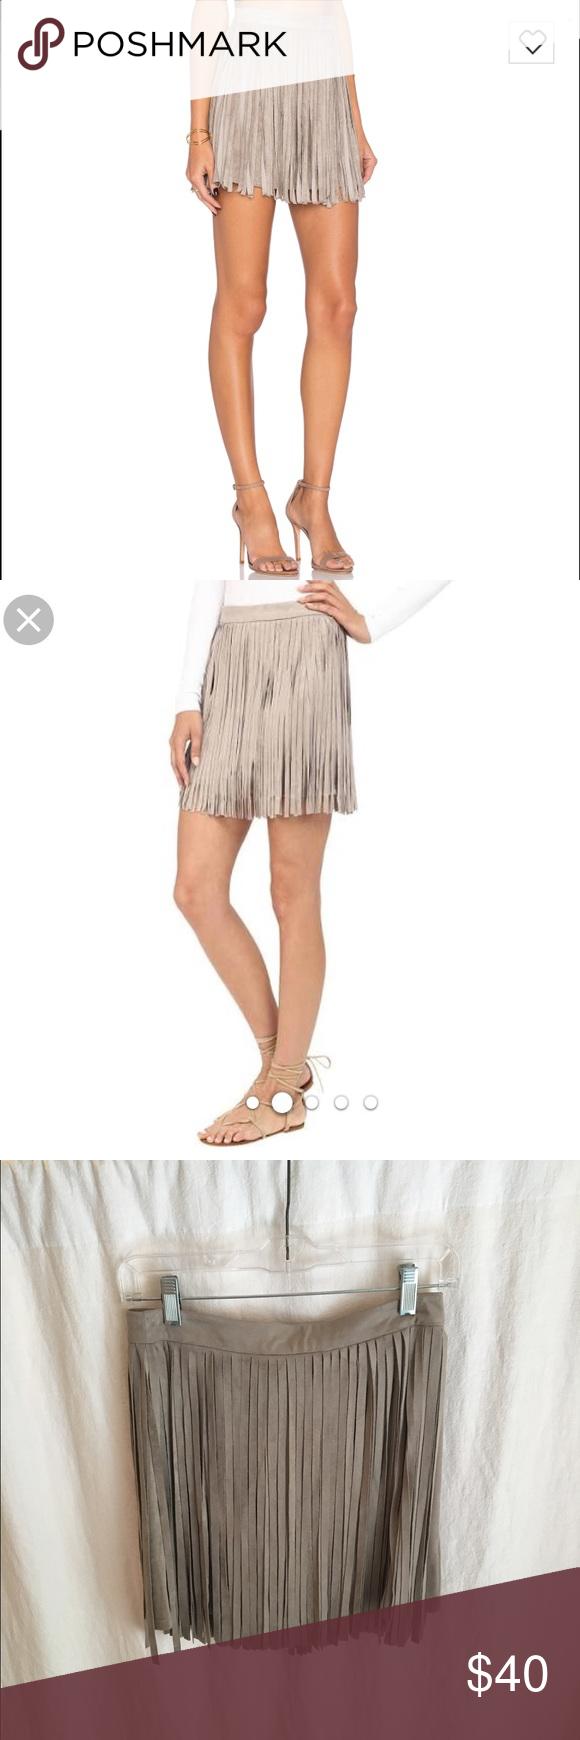 BB Dakota Suede Fringe Skirt Faux suede fringe skirt in Toffee BB Dakota Skirts